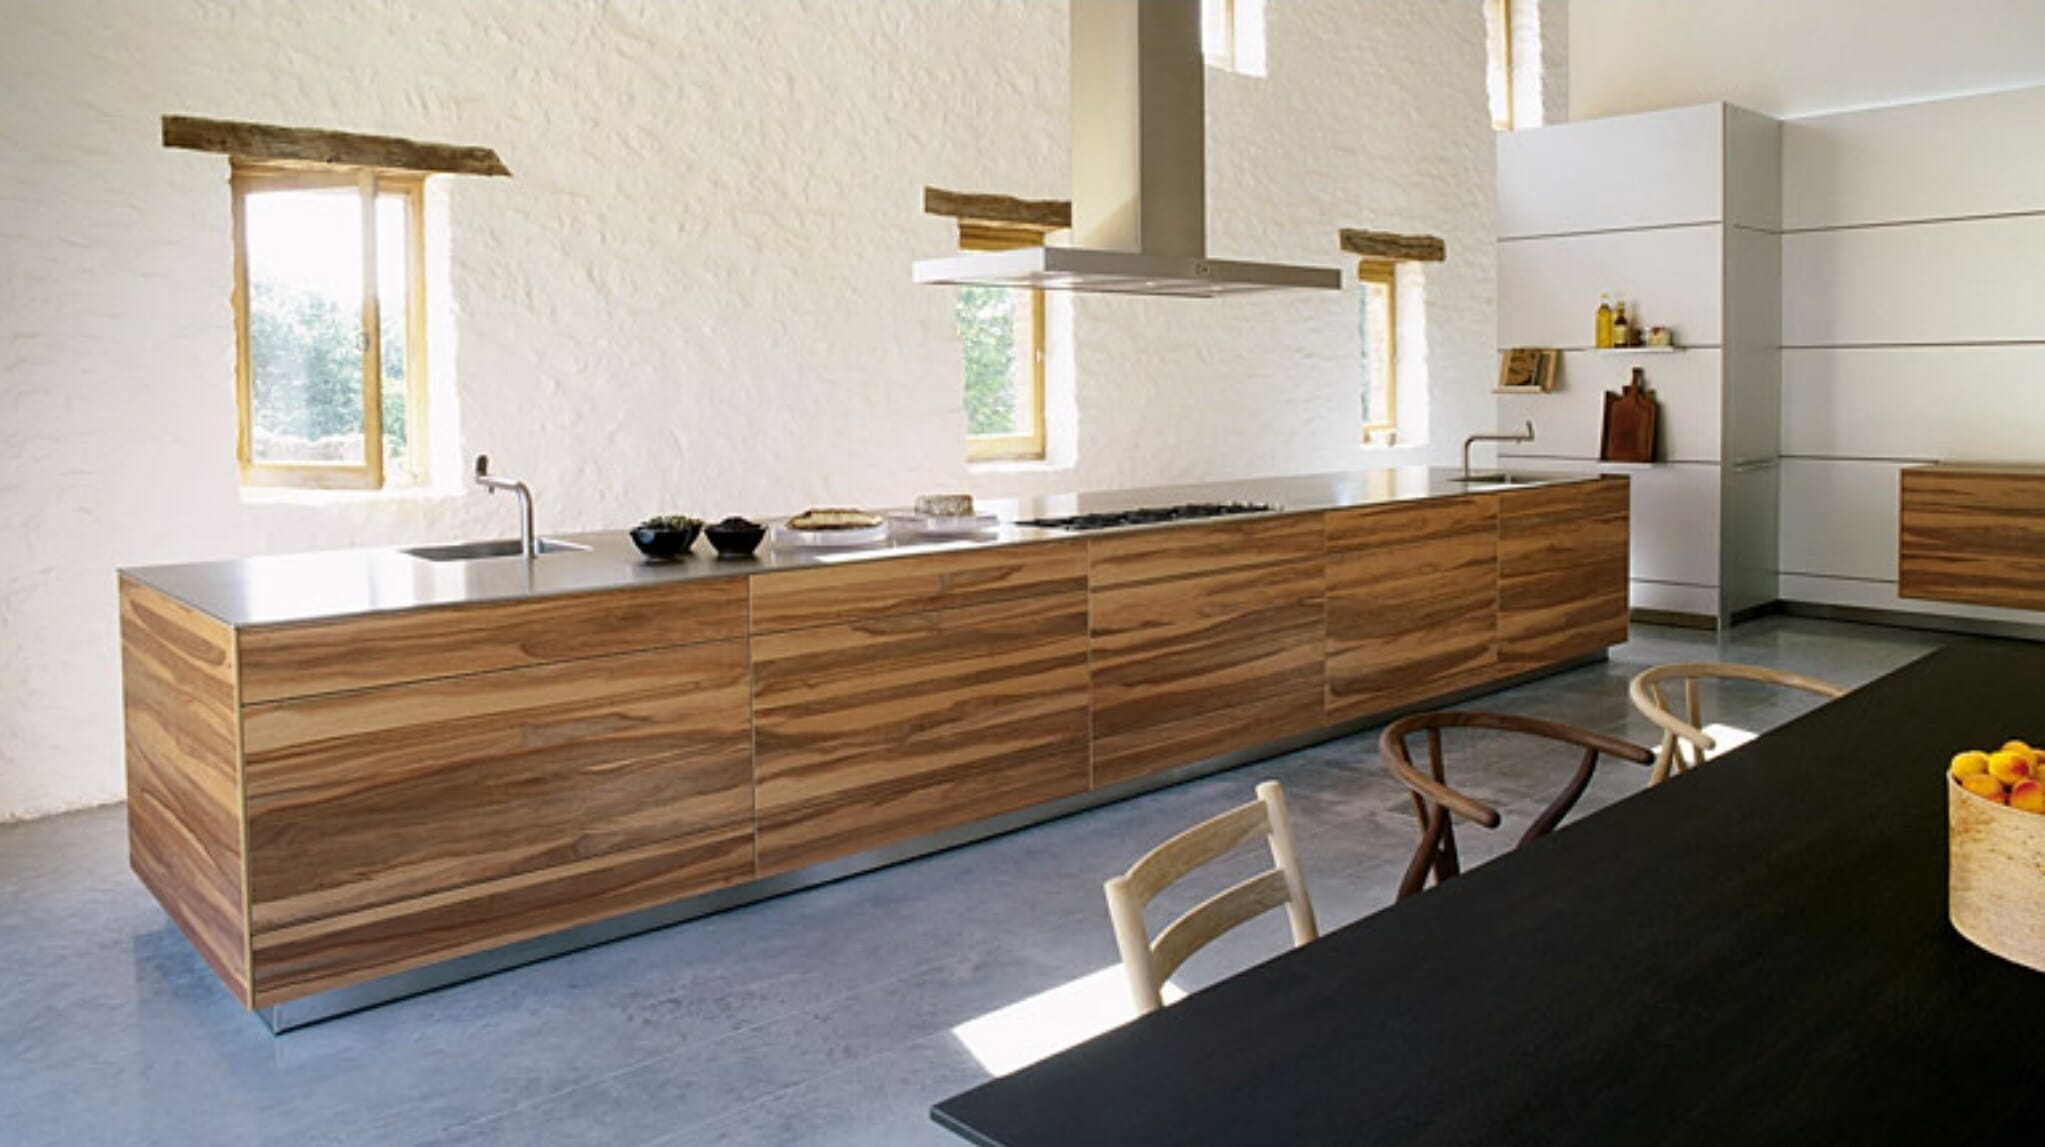 How to Design a Sleek Contemporary Kitchen Online